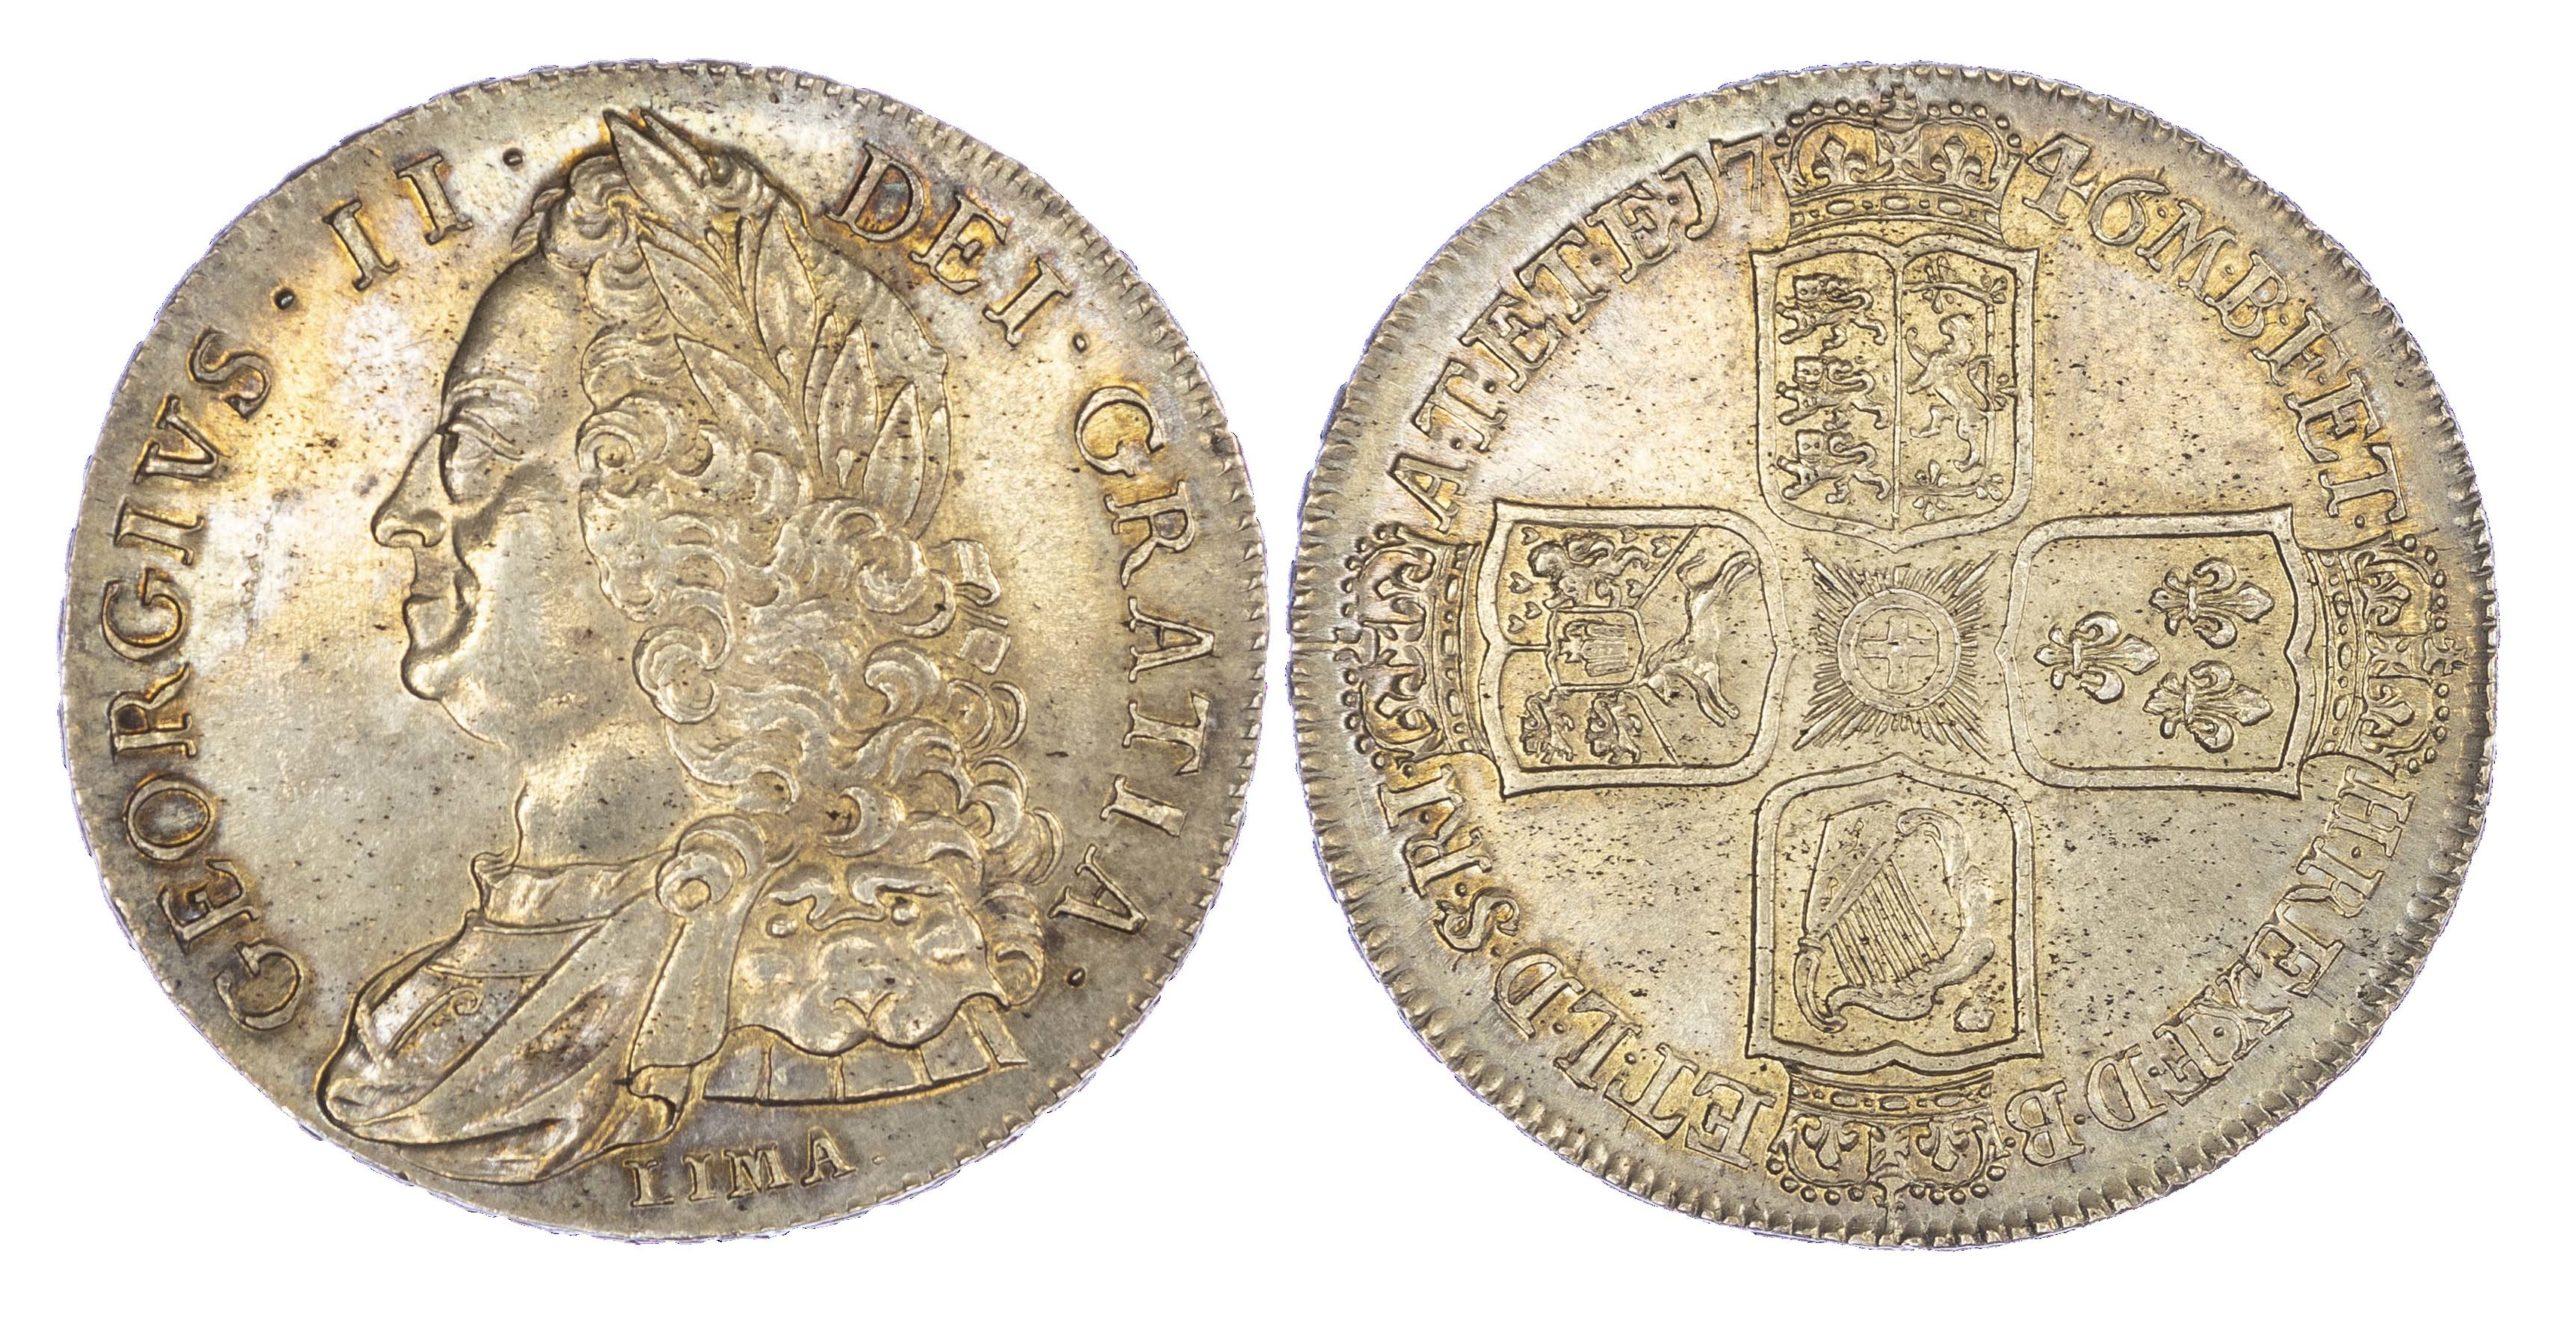 George II (1727-1760), Crown, 1746 LIMA